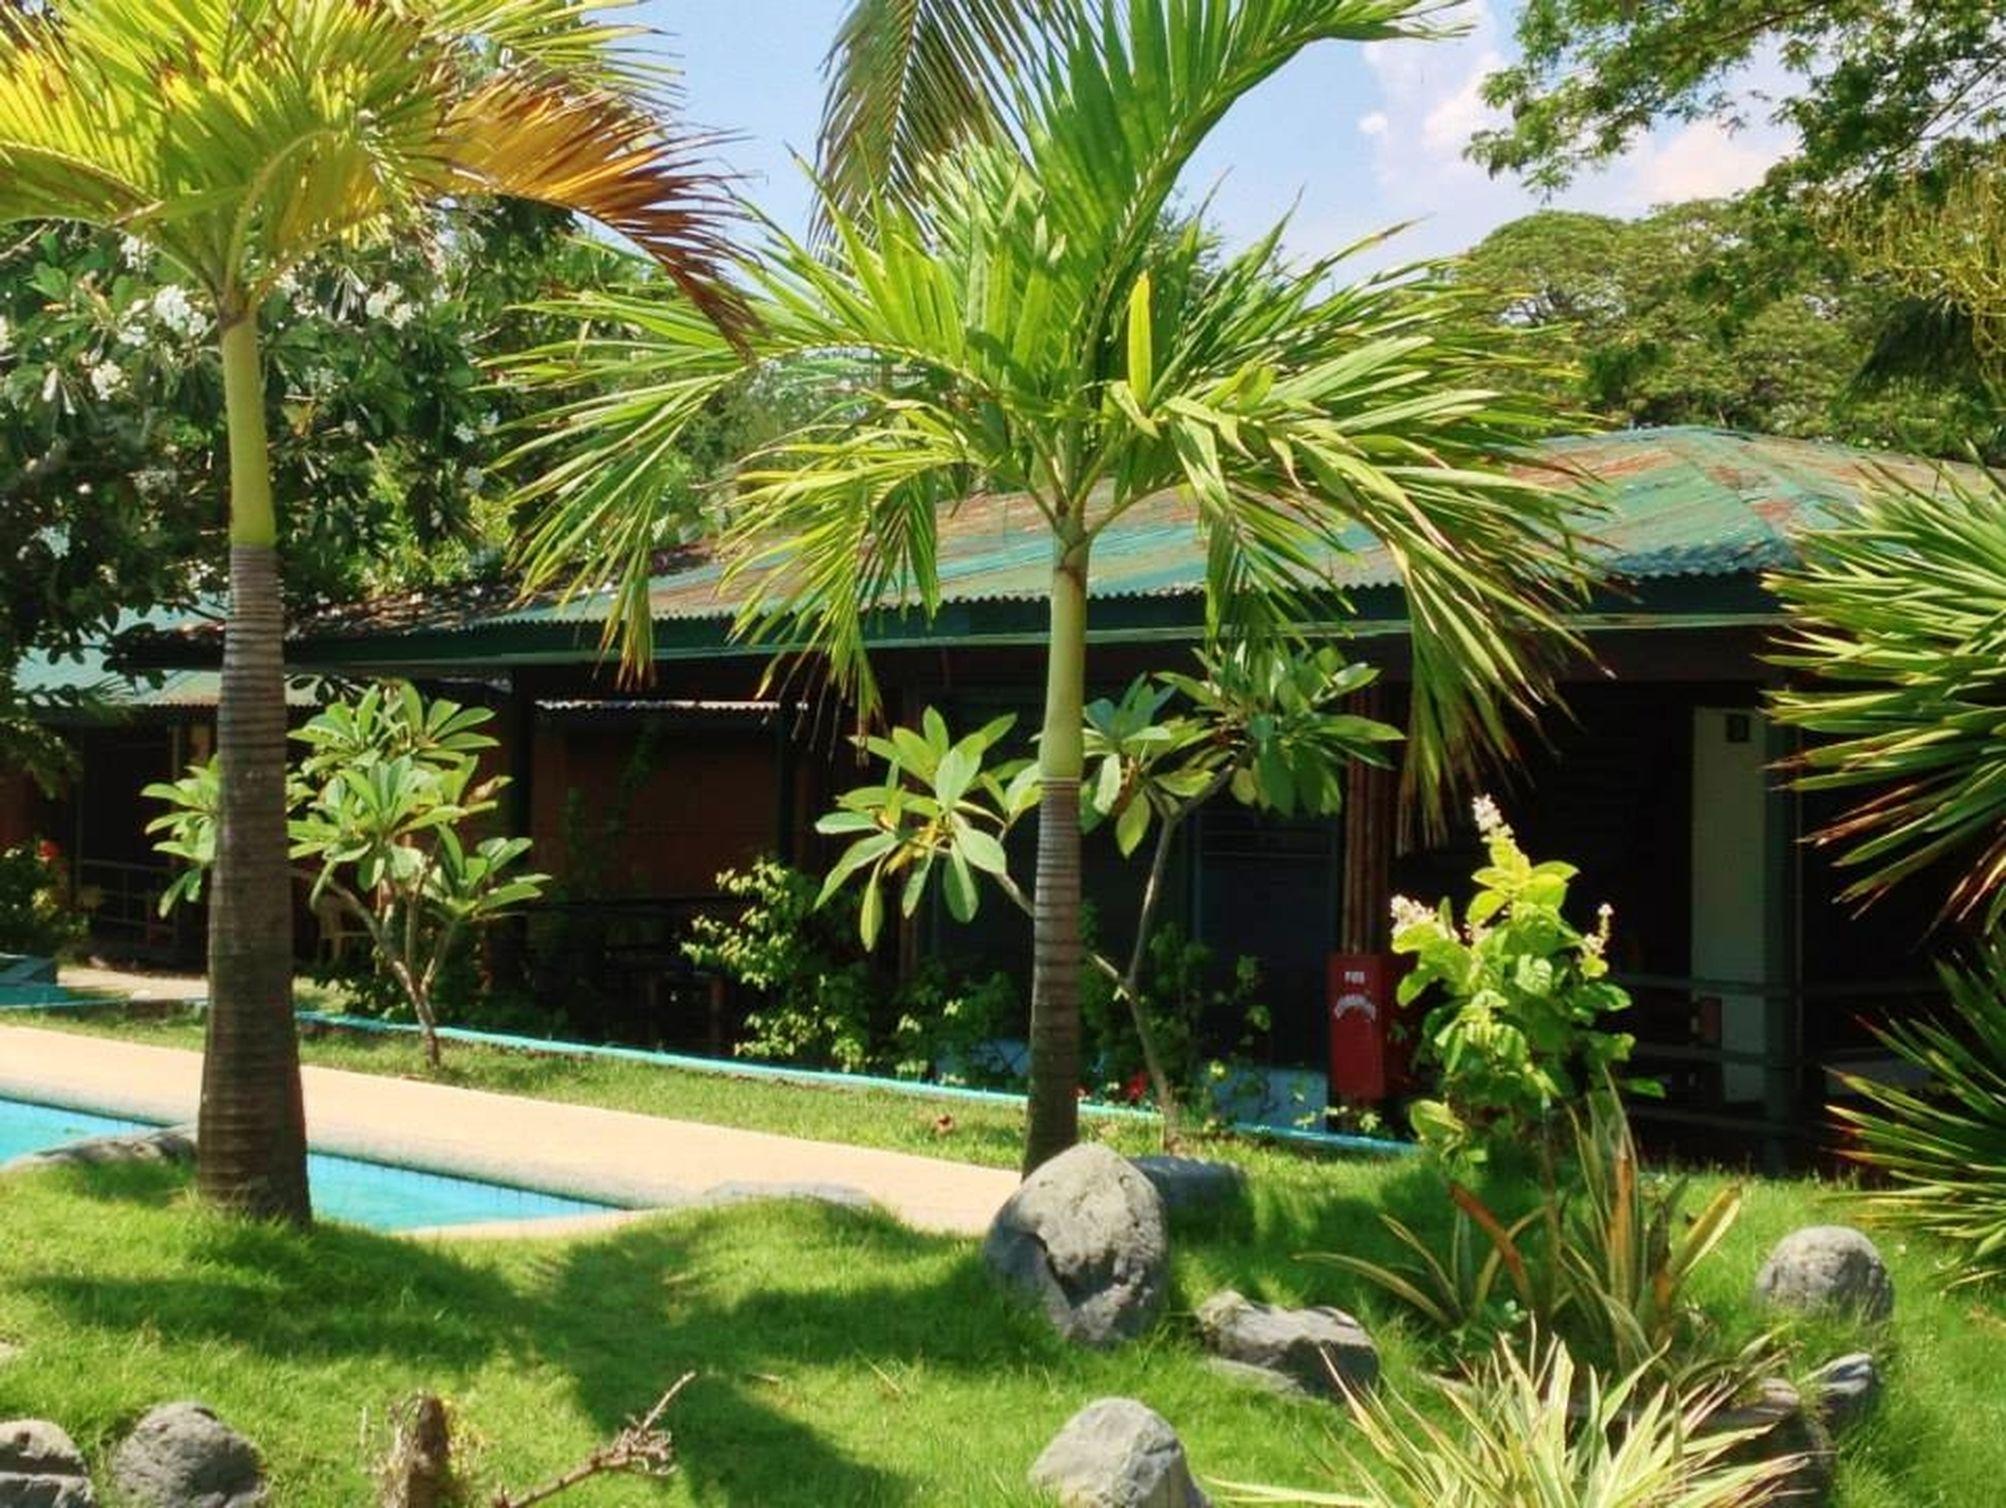 Bali Hai Beach Resort Vtwctr